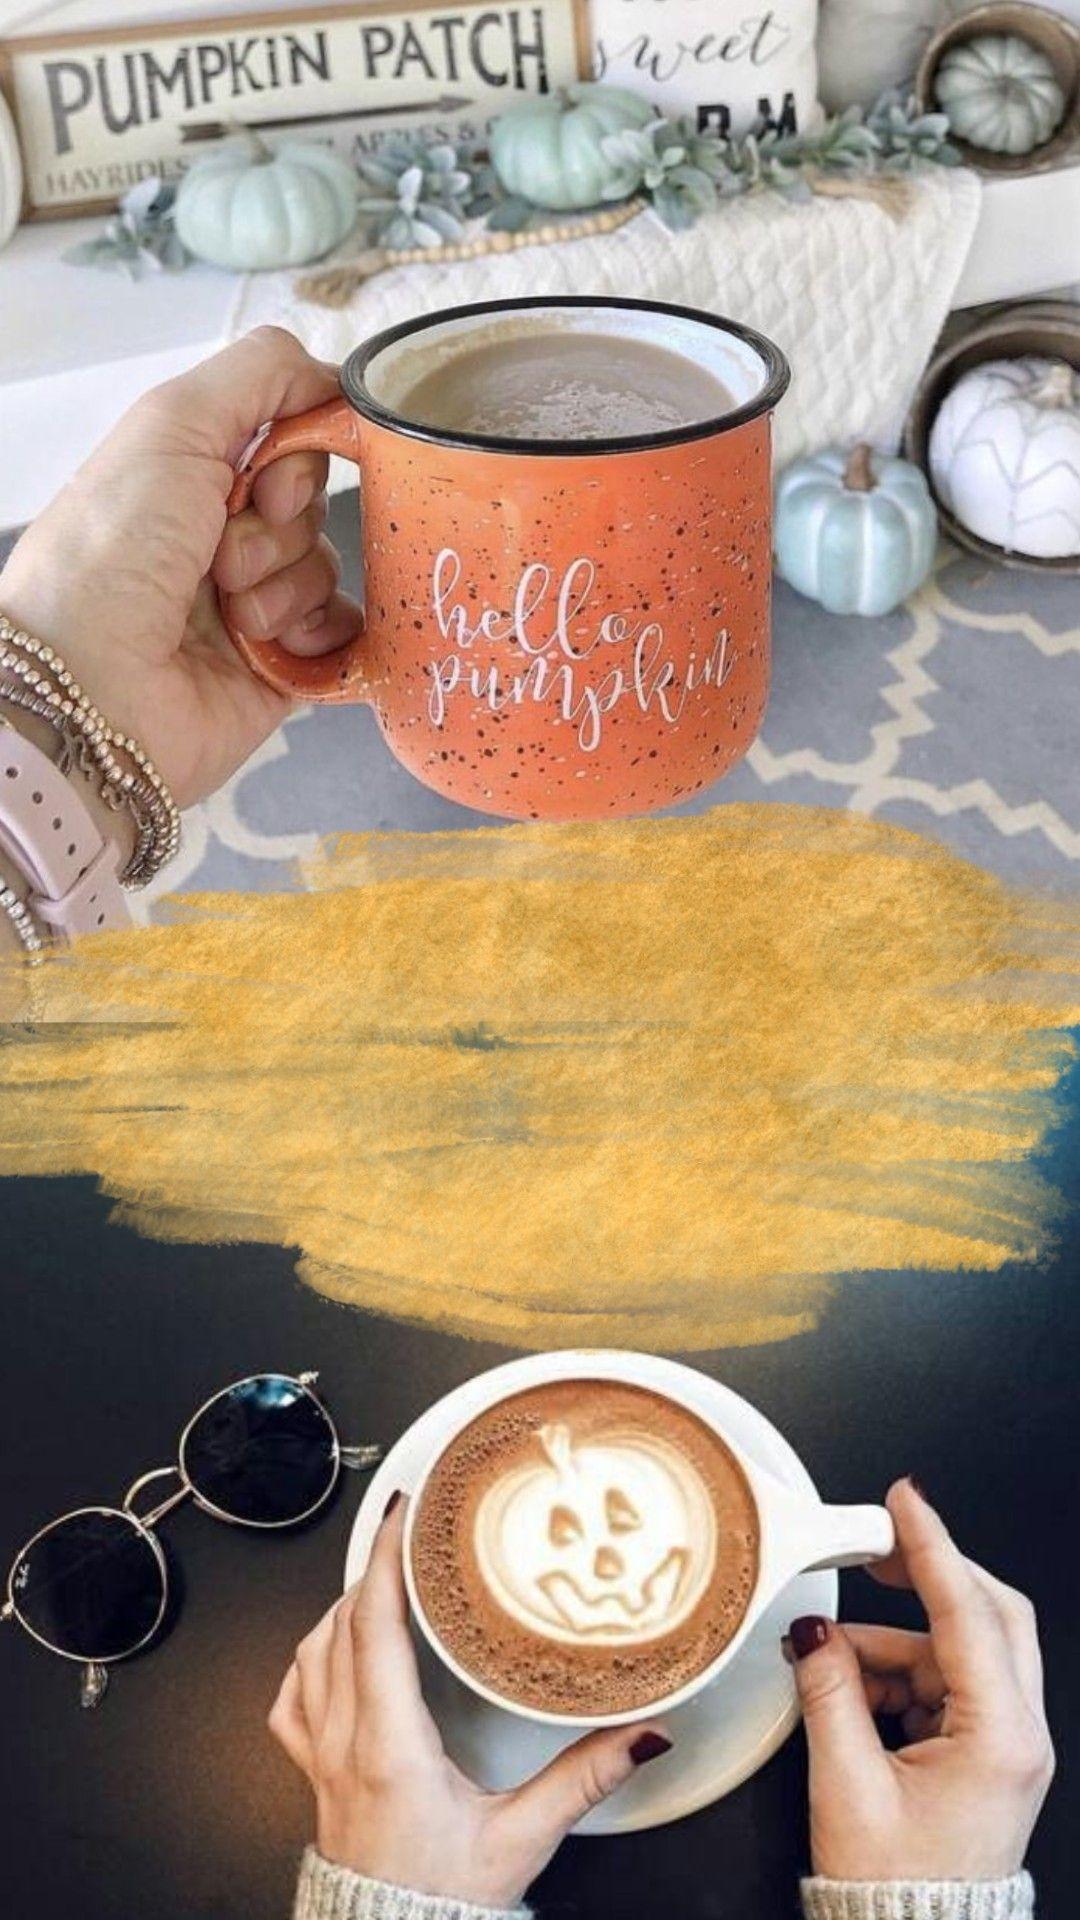 Keto Coffee, Pumpkin Spice, ItWorks Healthy coffee